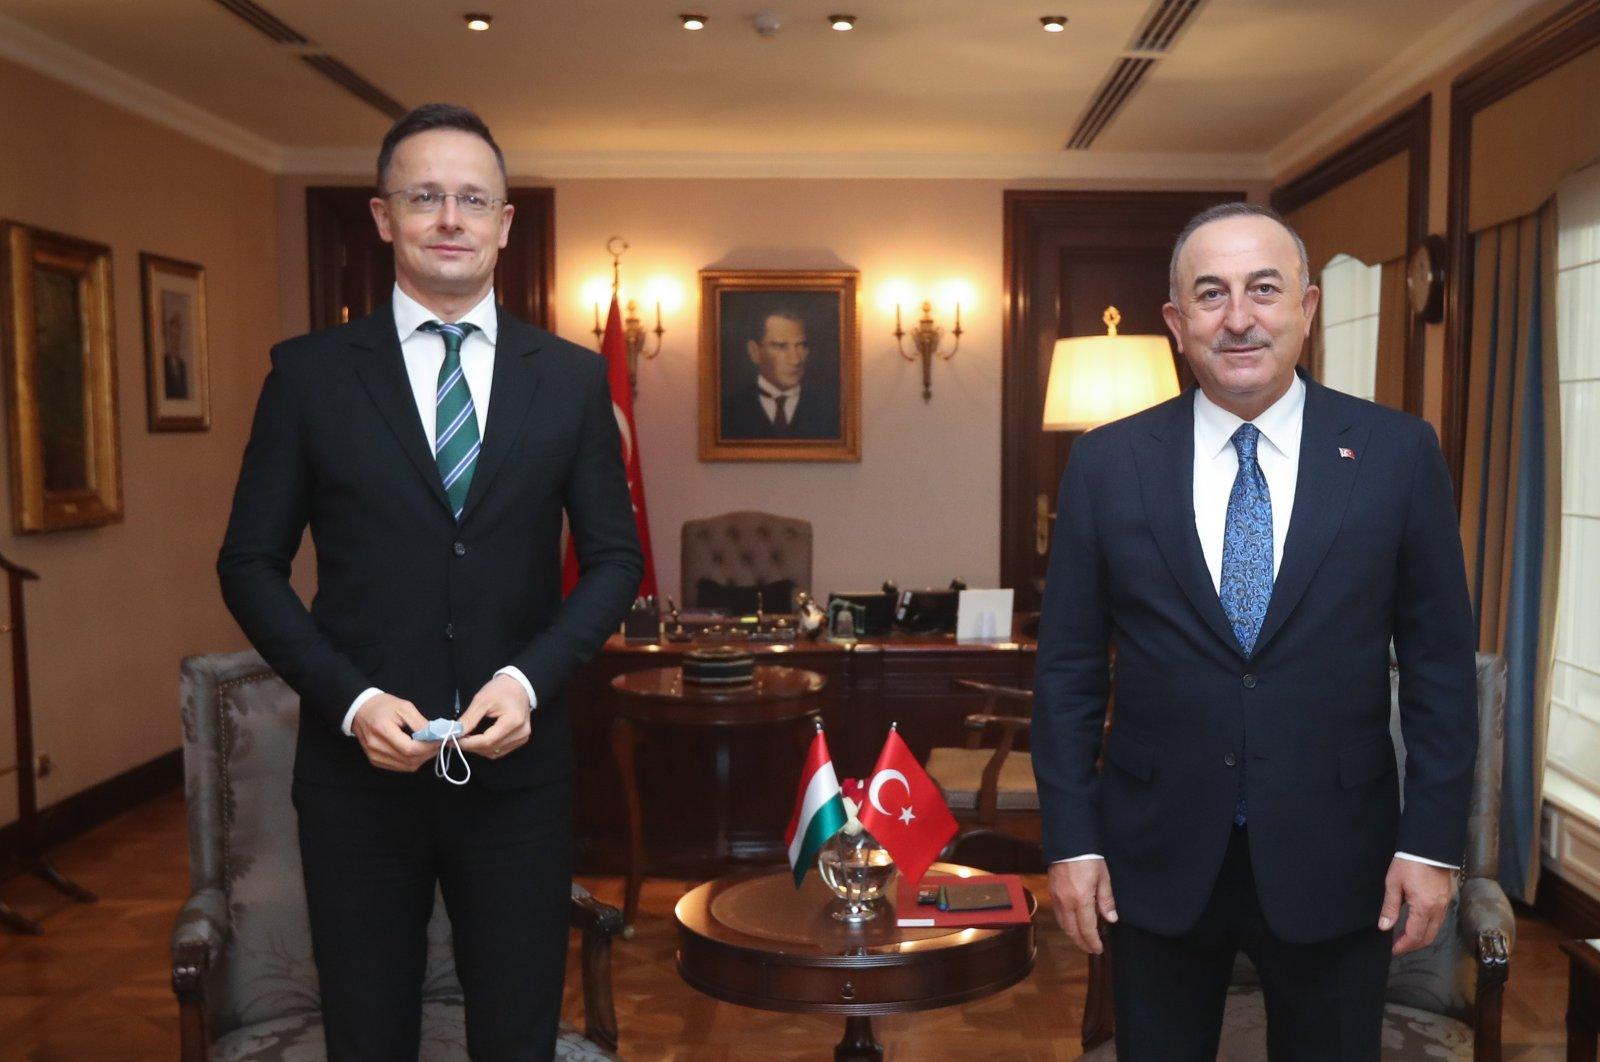 Foreign Minister Mevlüt Çavuşoğlu hosts his Hungarian counterpart Peter Szijjarto in the capital Ankara, Dec. 8, 2020. (AA Photo)